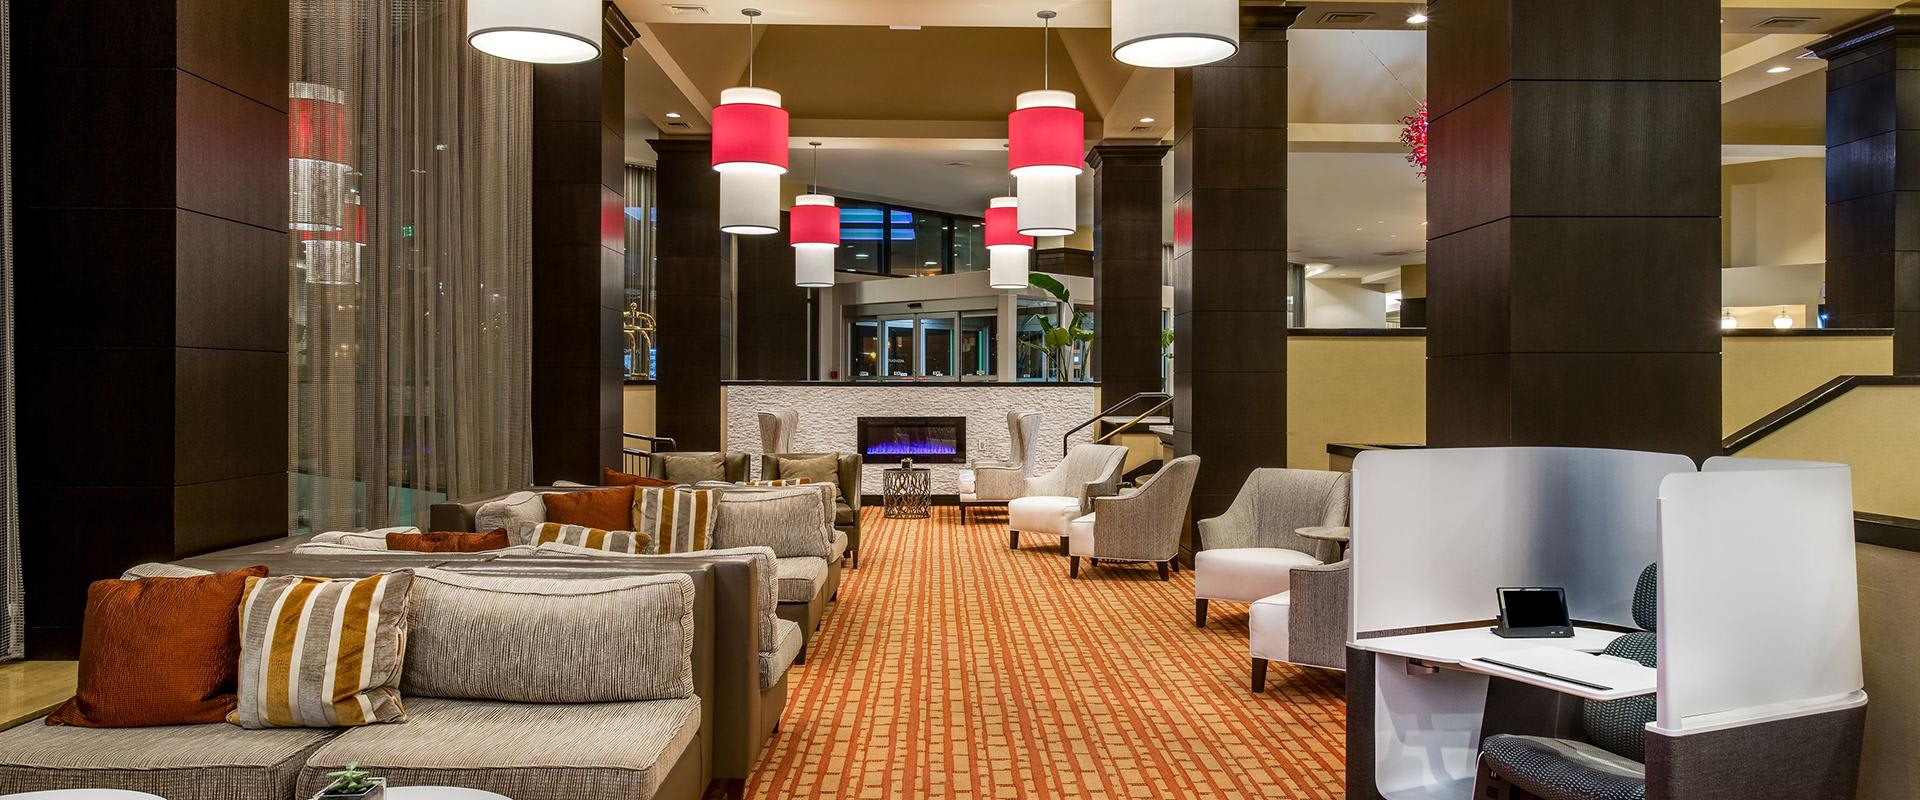 White Plains Hotel Lobby Seating